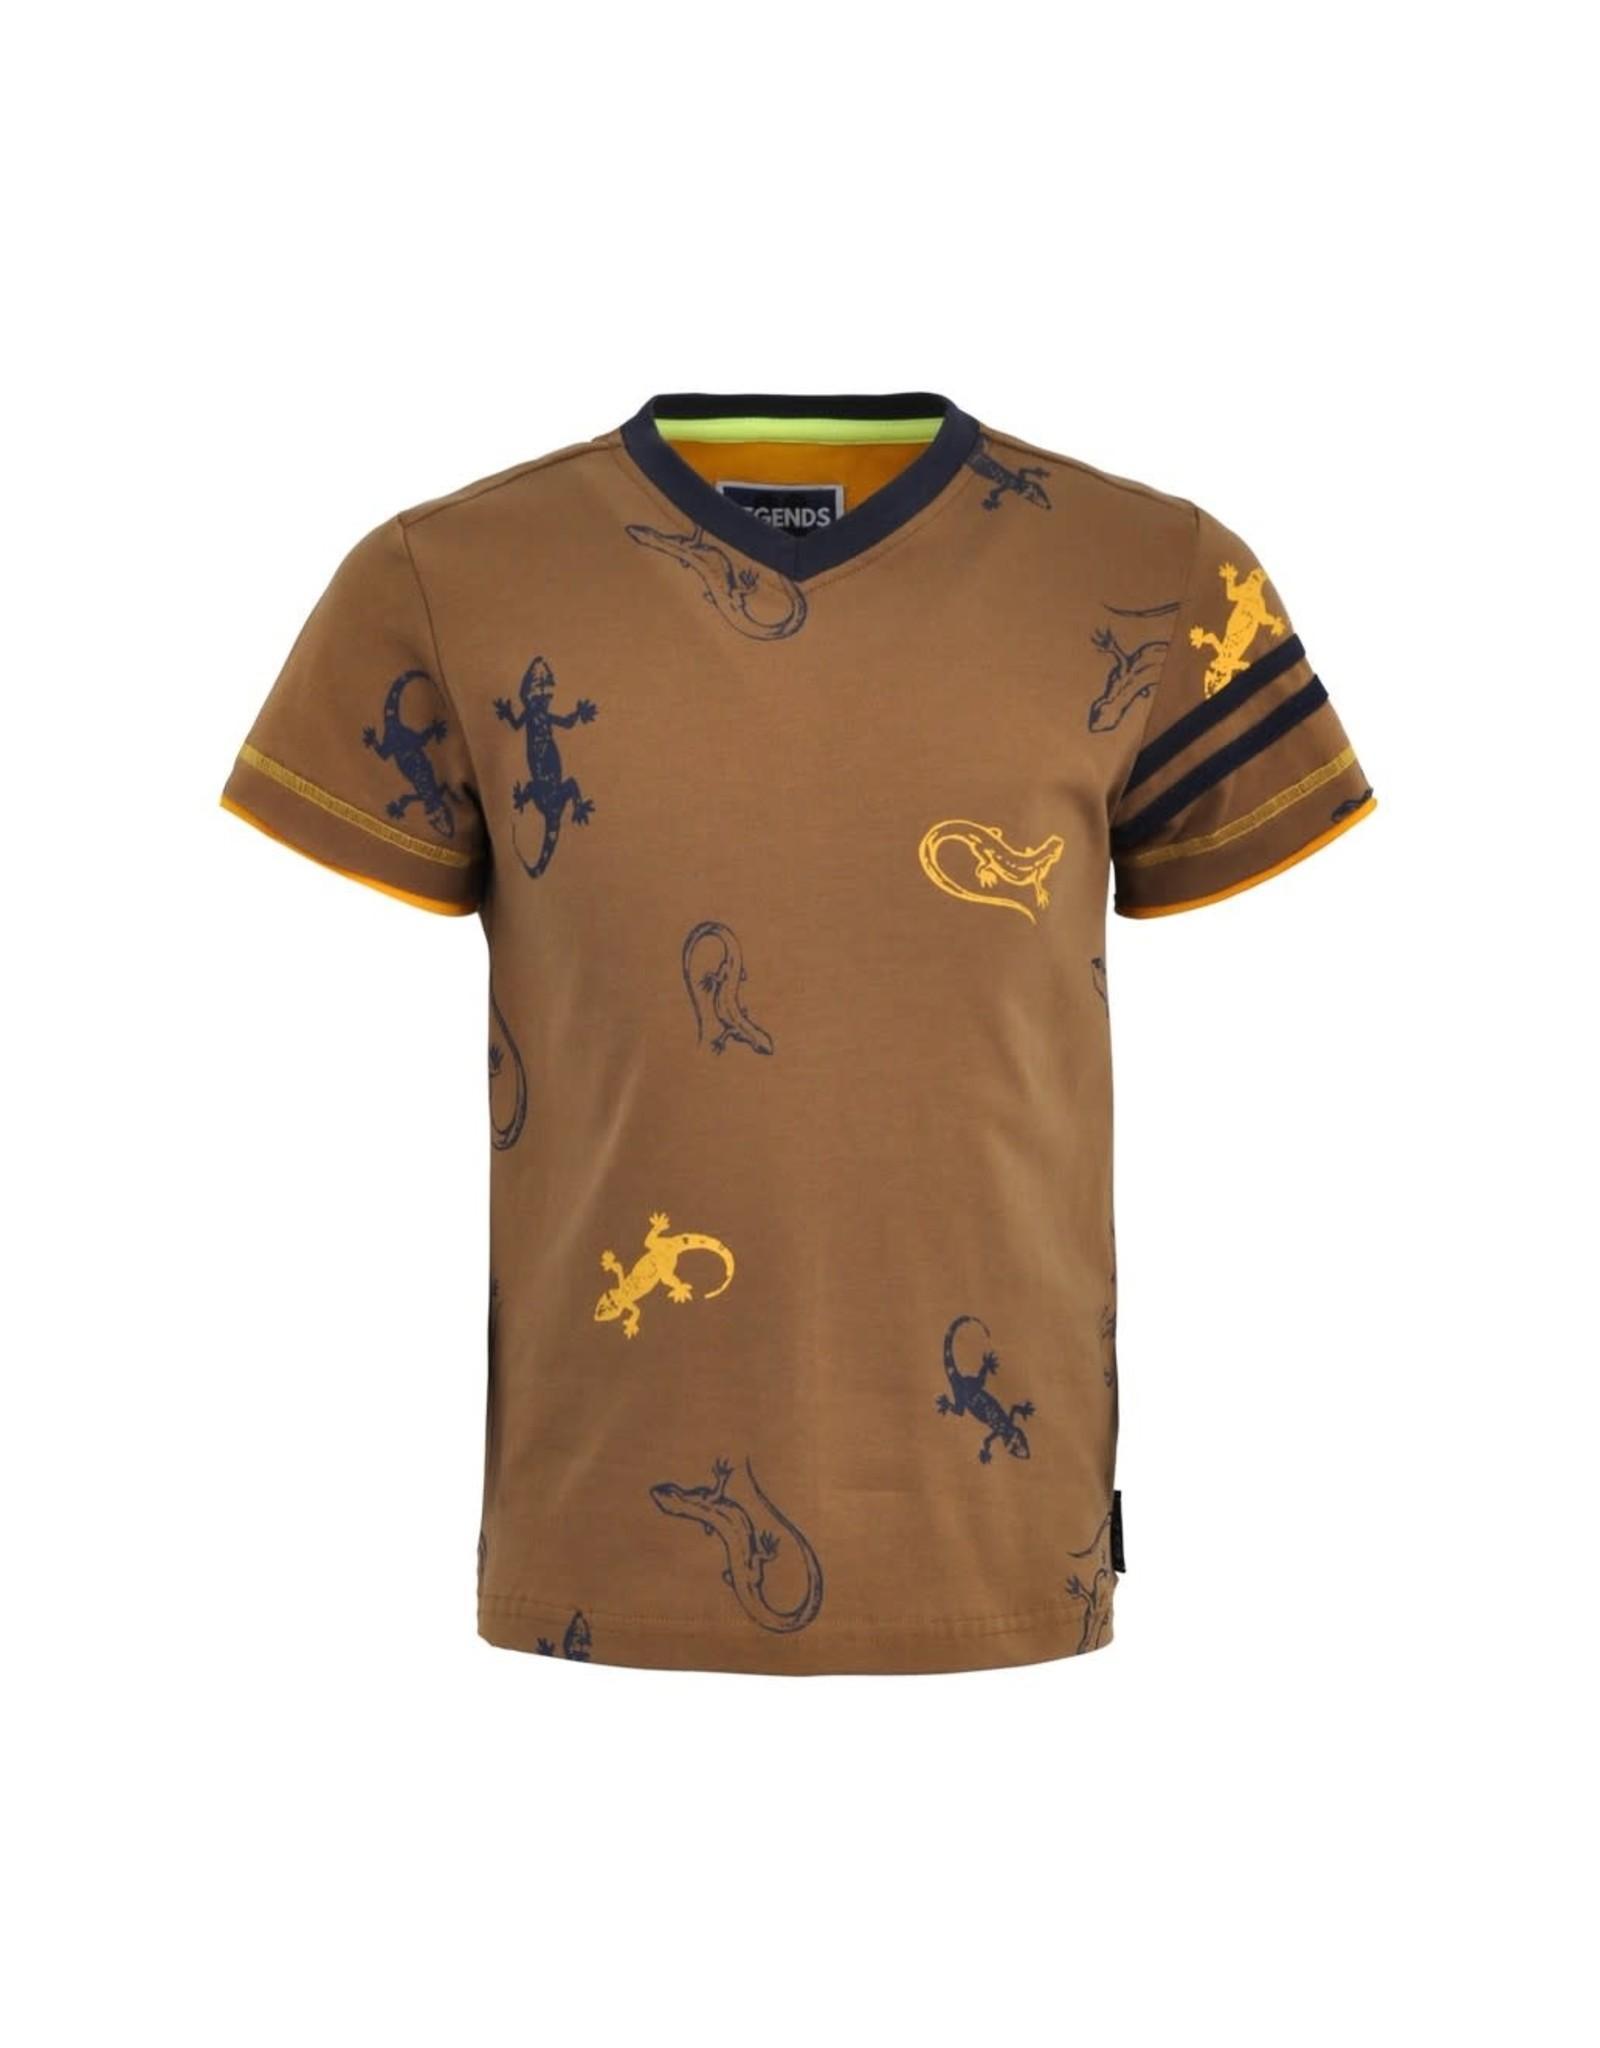 Legends jongens t-shirt Olger Brown